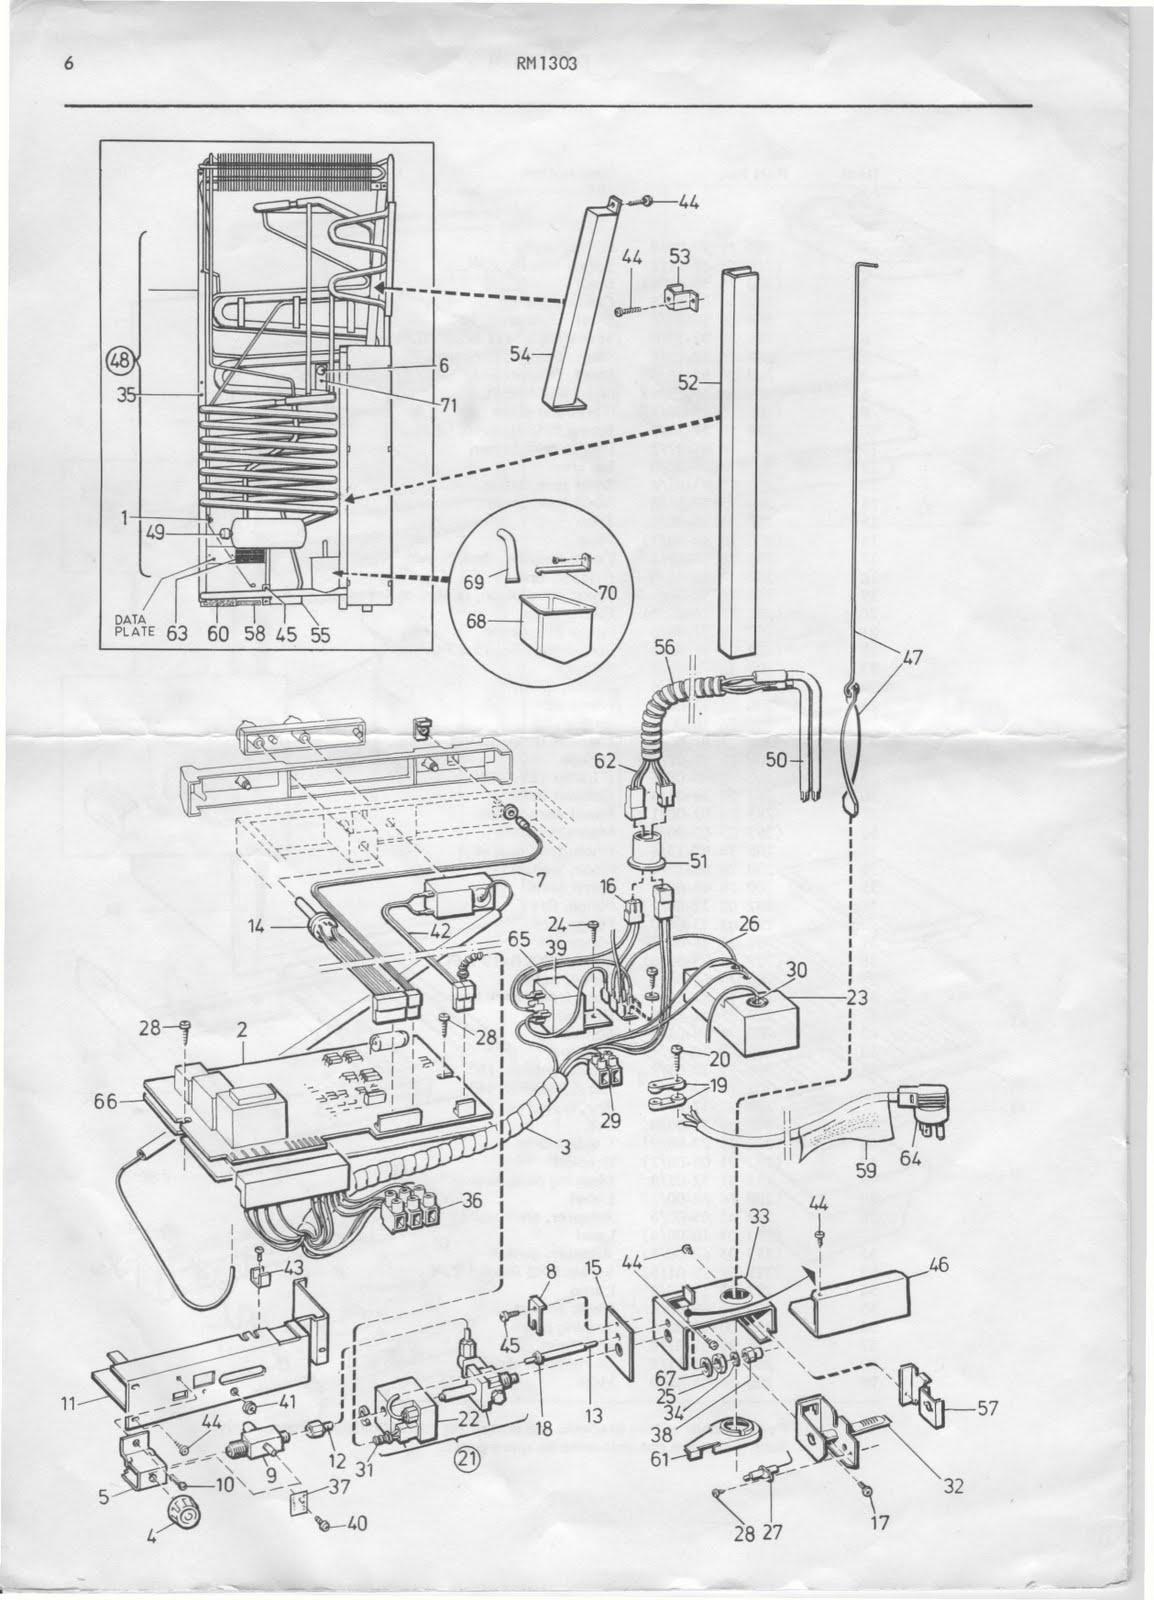 1983 Fleetwood Pace Arrow Owners Manuals: Dometic refridgerator RM 1303 parts manual